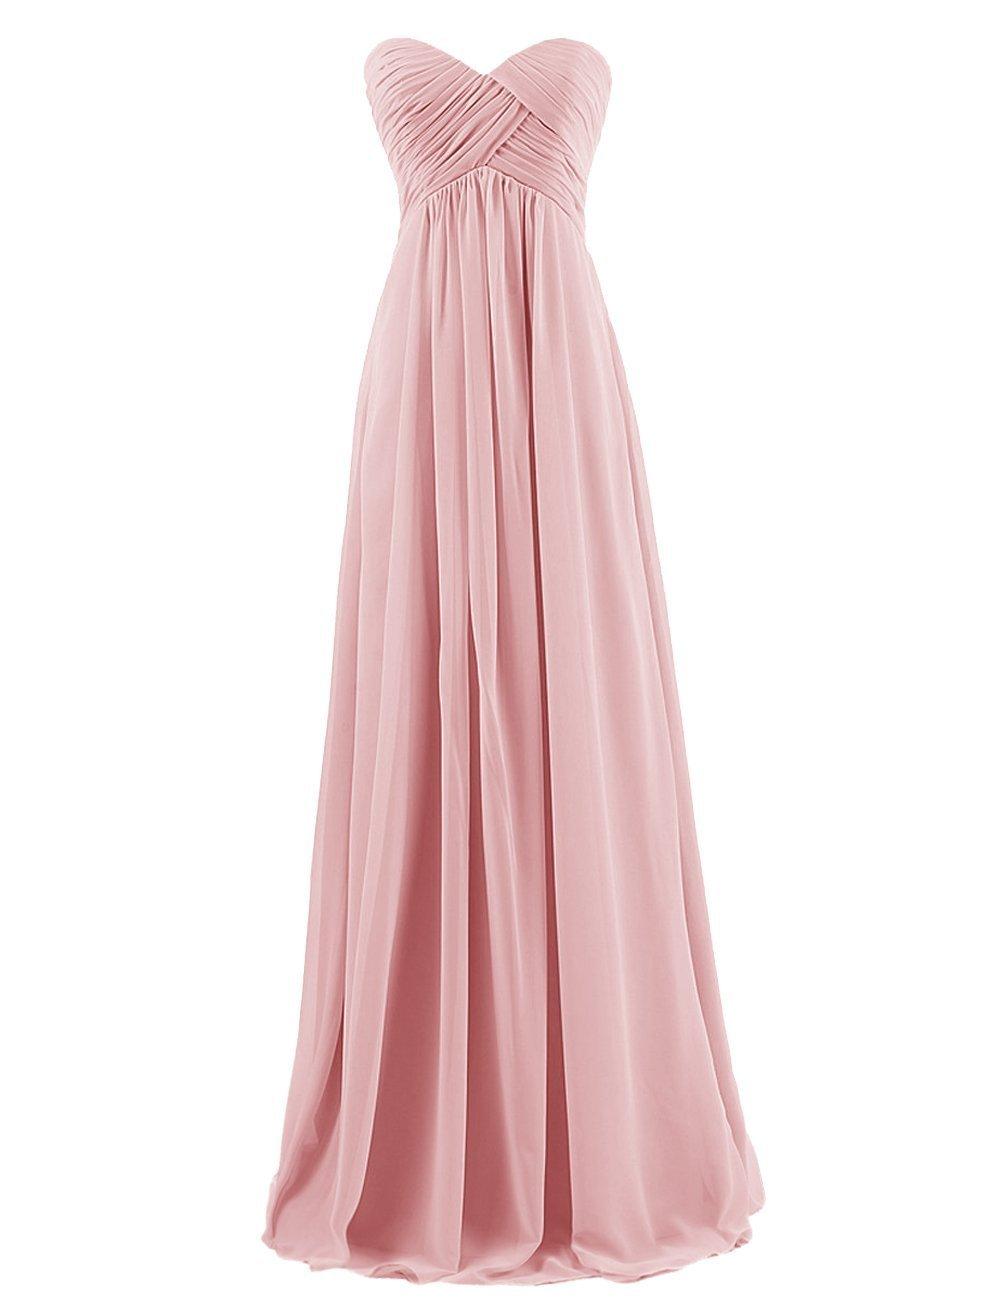 Long Blush Bridesmaid Dresses: Amazon.com